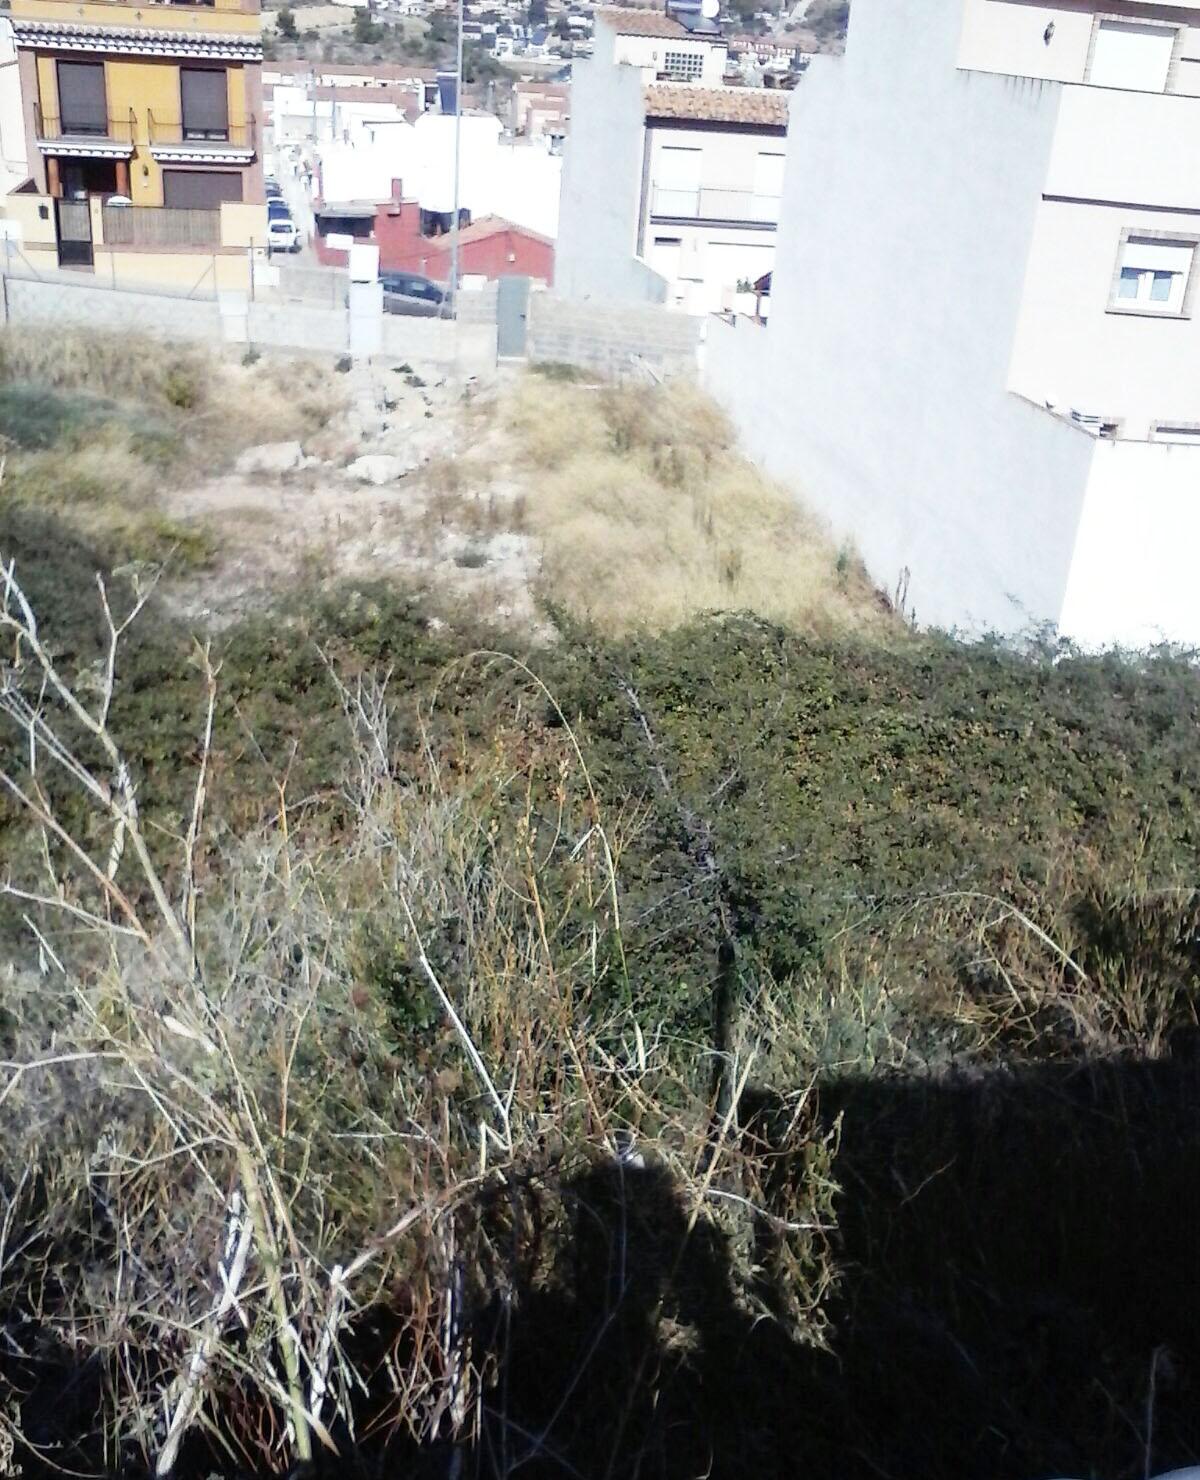 TERRENO EN VENTA EN LA VALL D'UIXÓ